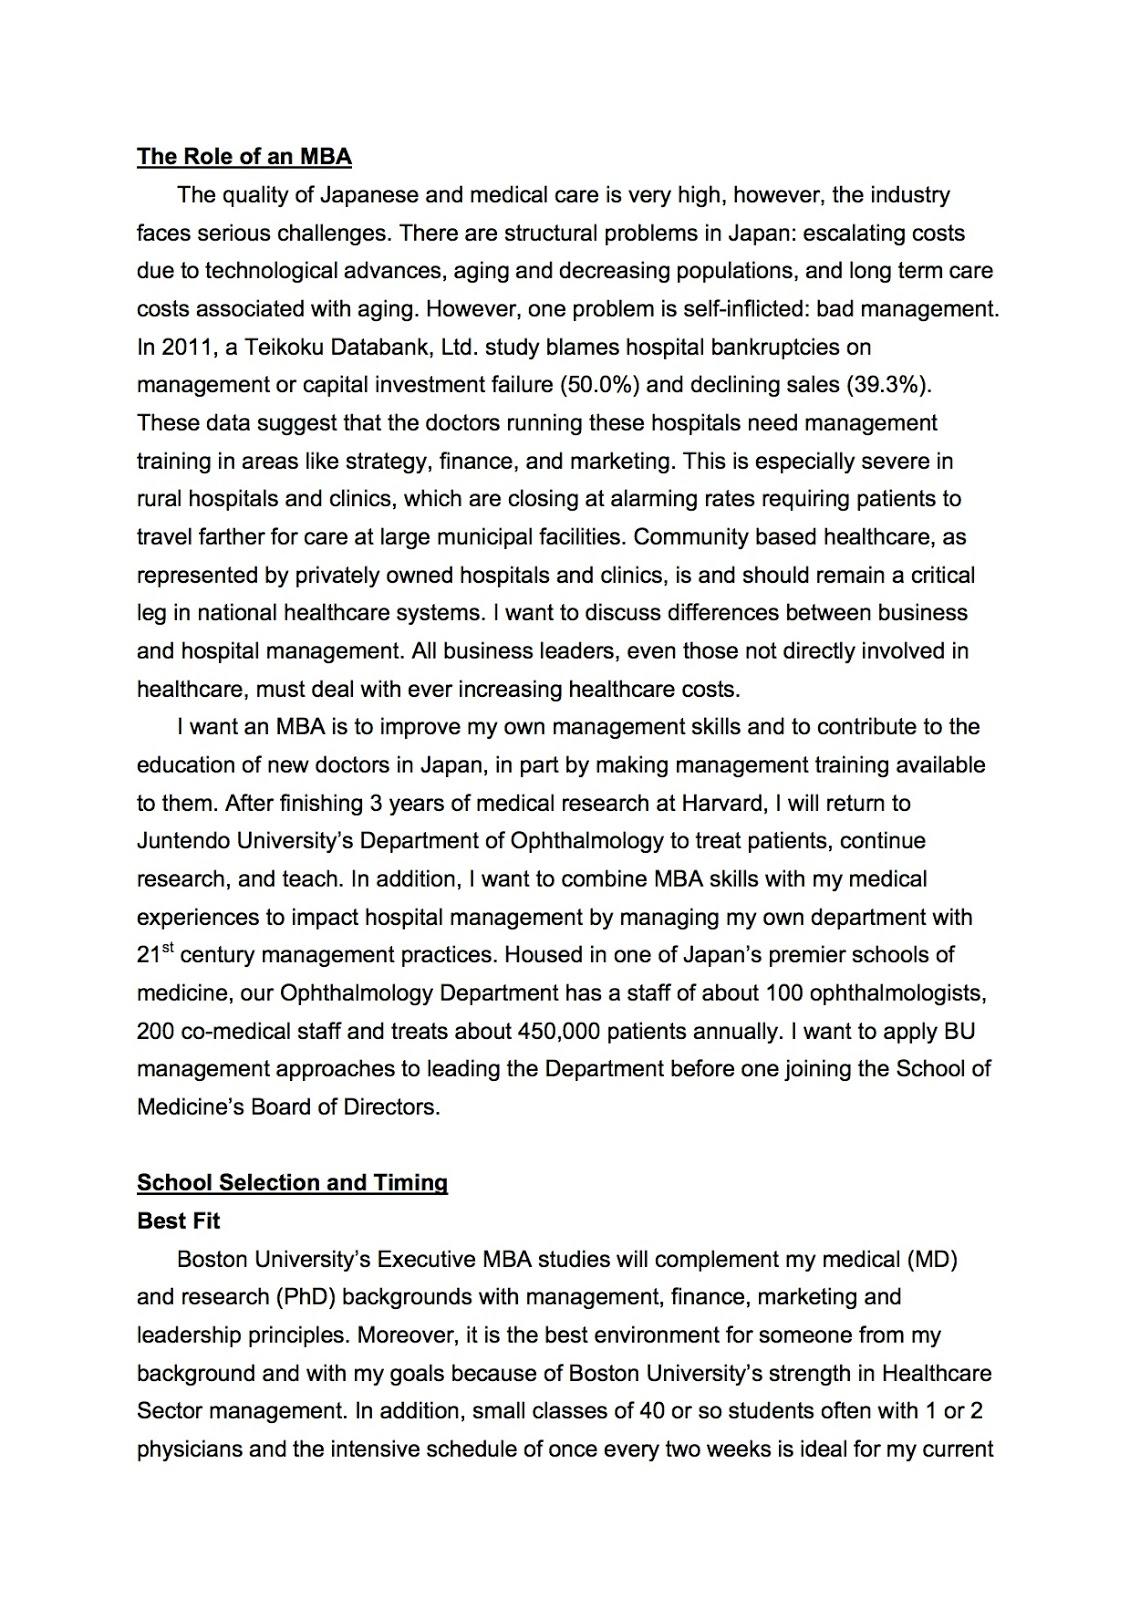 Villanova Admission Requirements Admission Essay Custom Writing For University